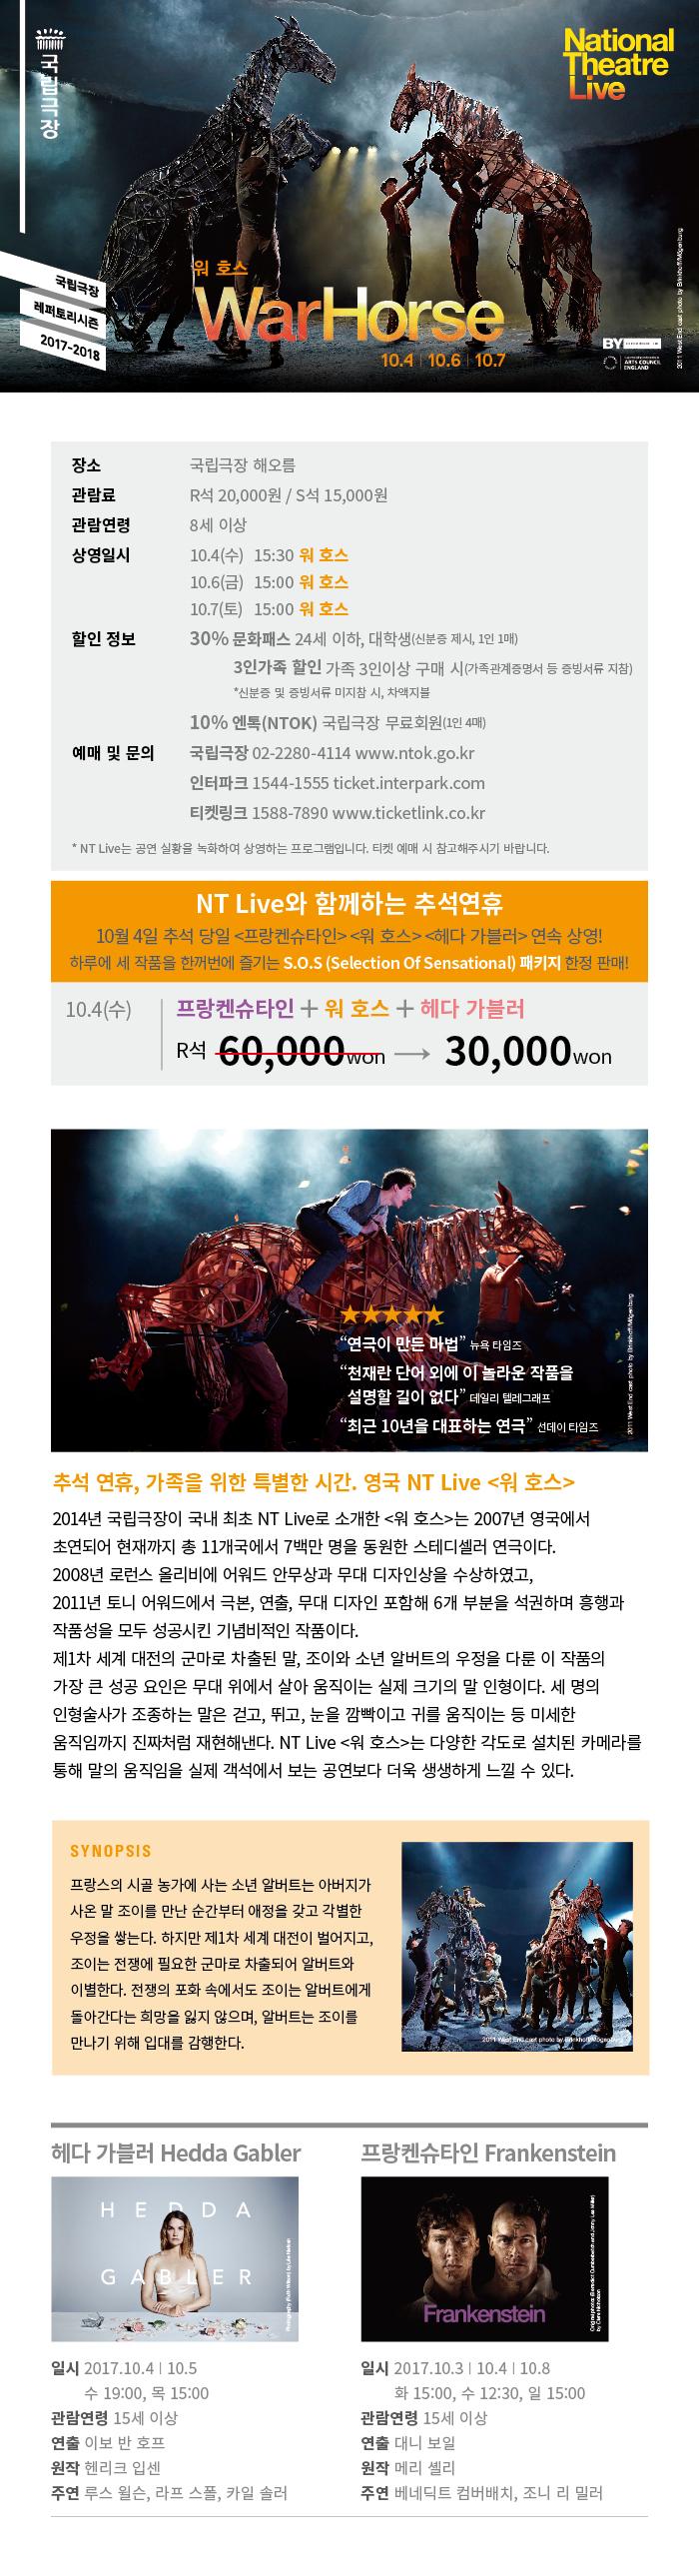 NT Live 워호스_웹전단_권종추가_국립극장_0915.jpg